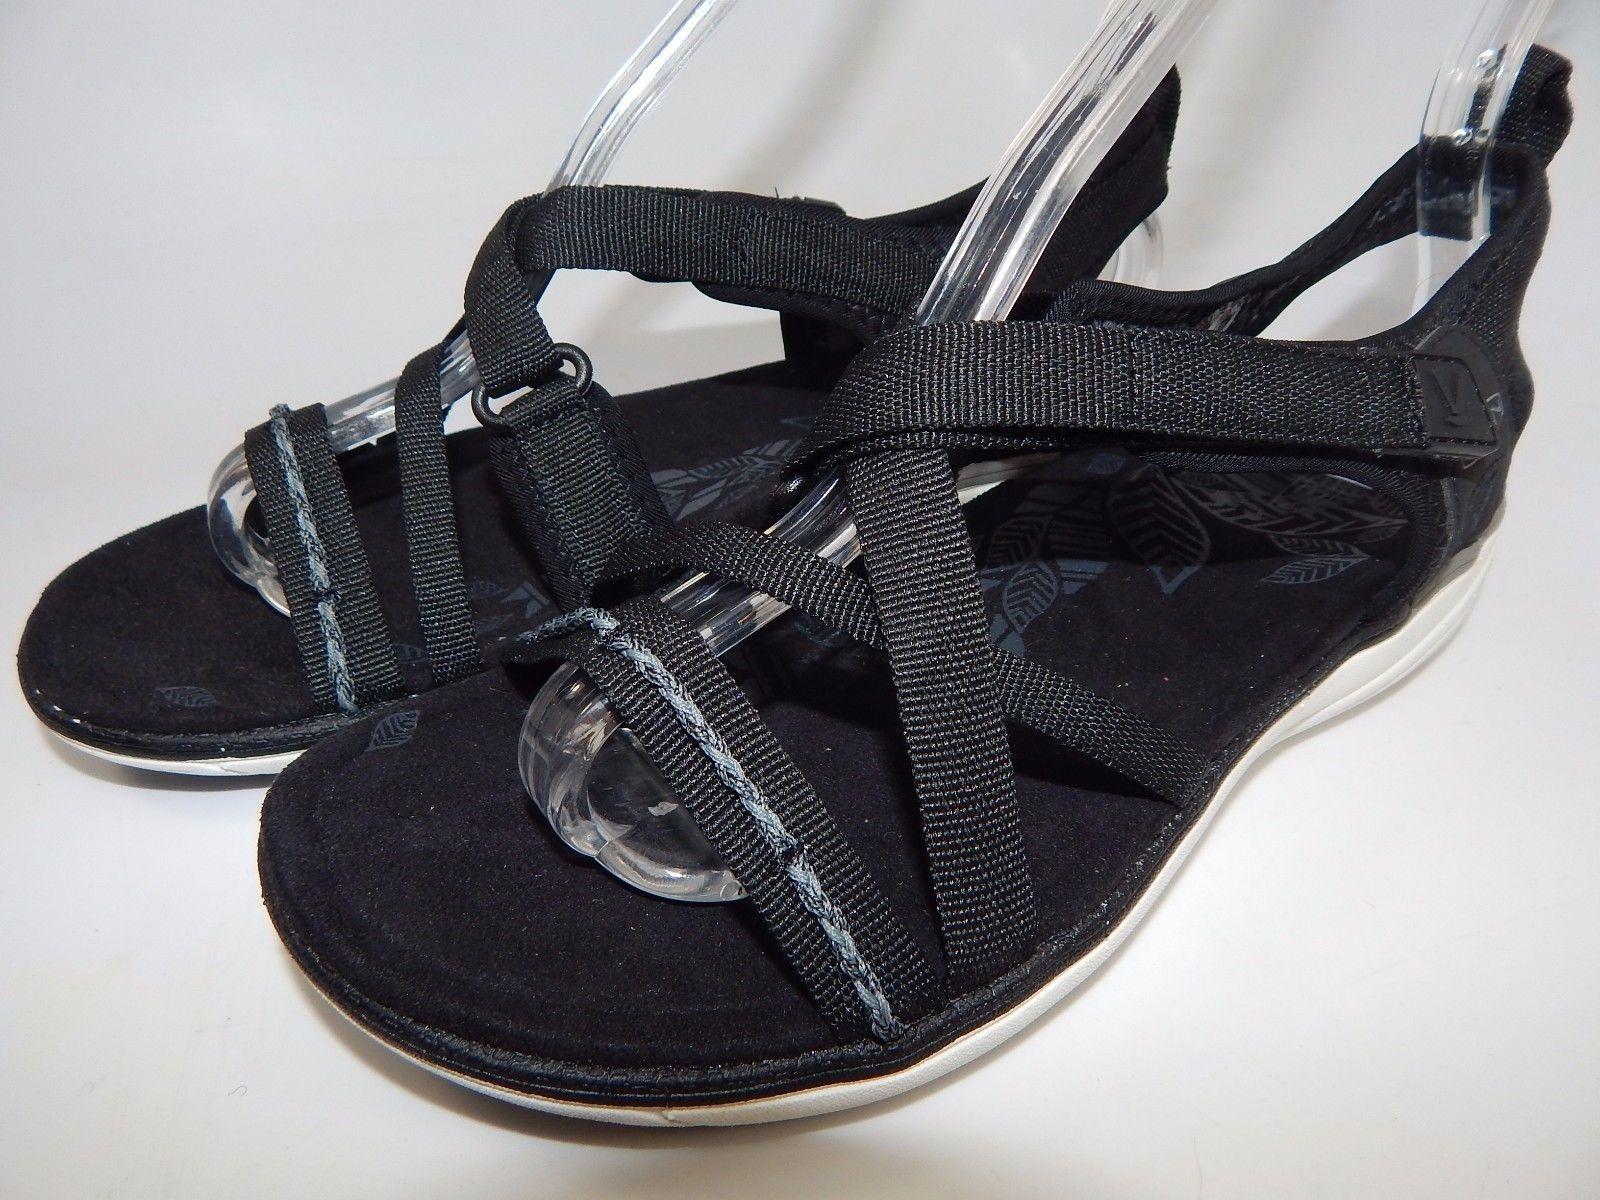 Keen Maya Strap Women's Sports Sandals Sz US 7 M (B) EU 37.5 Black Gargoyle